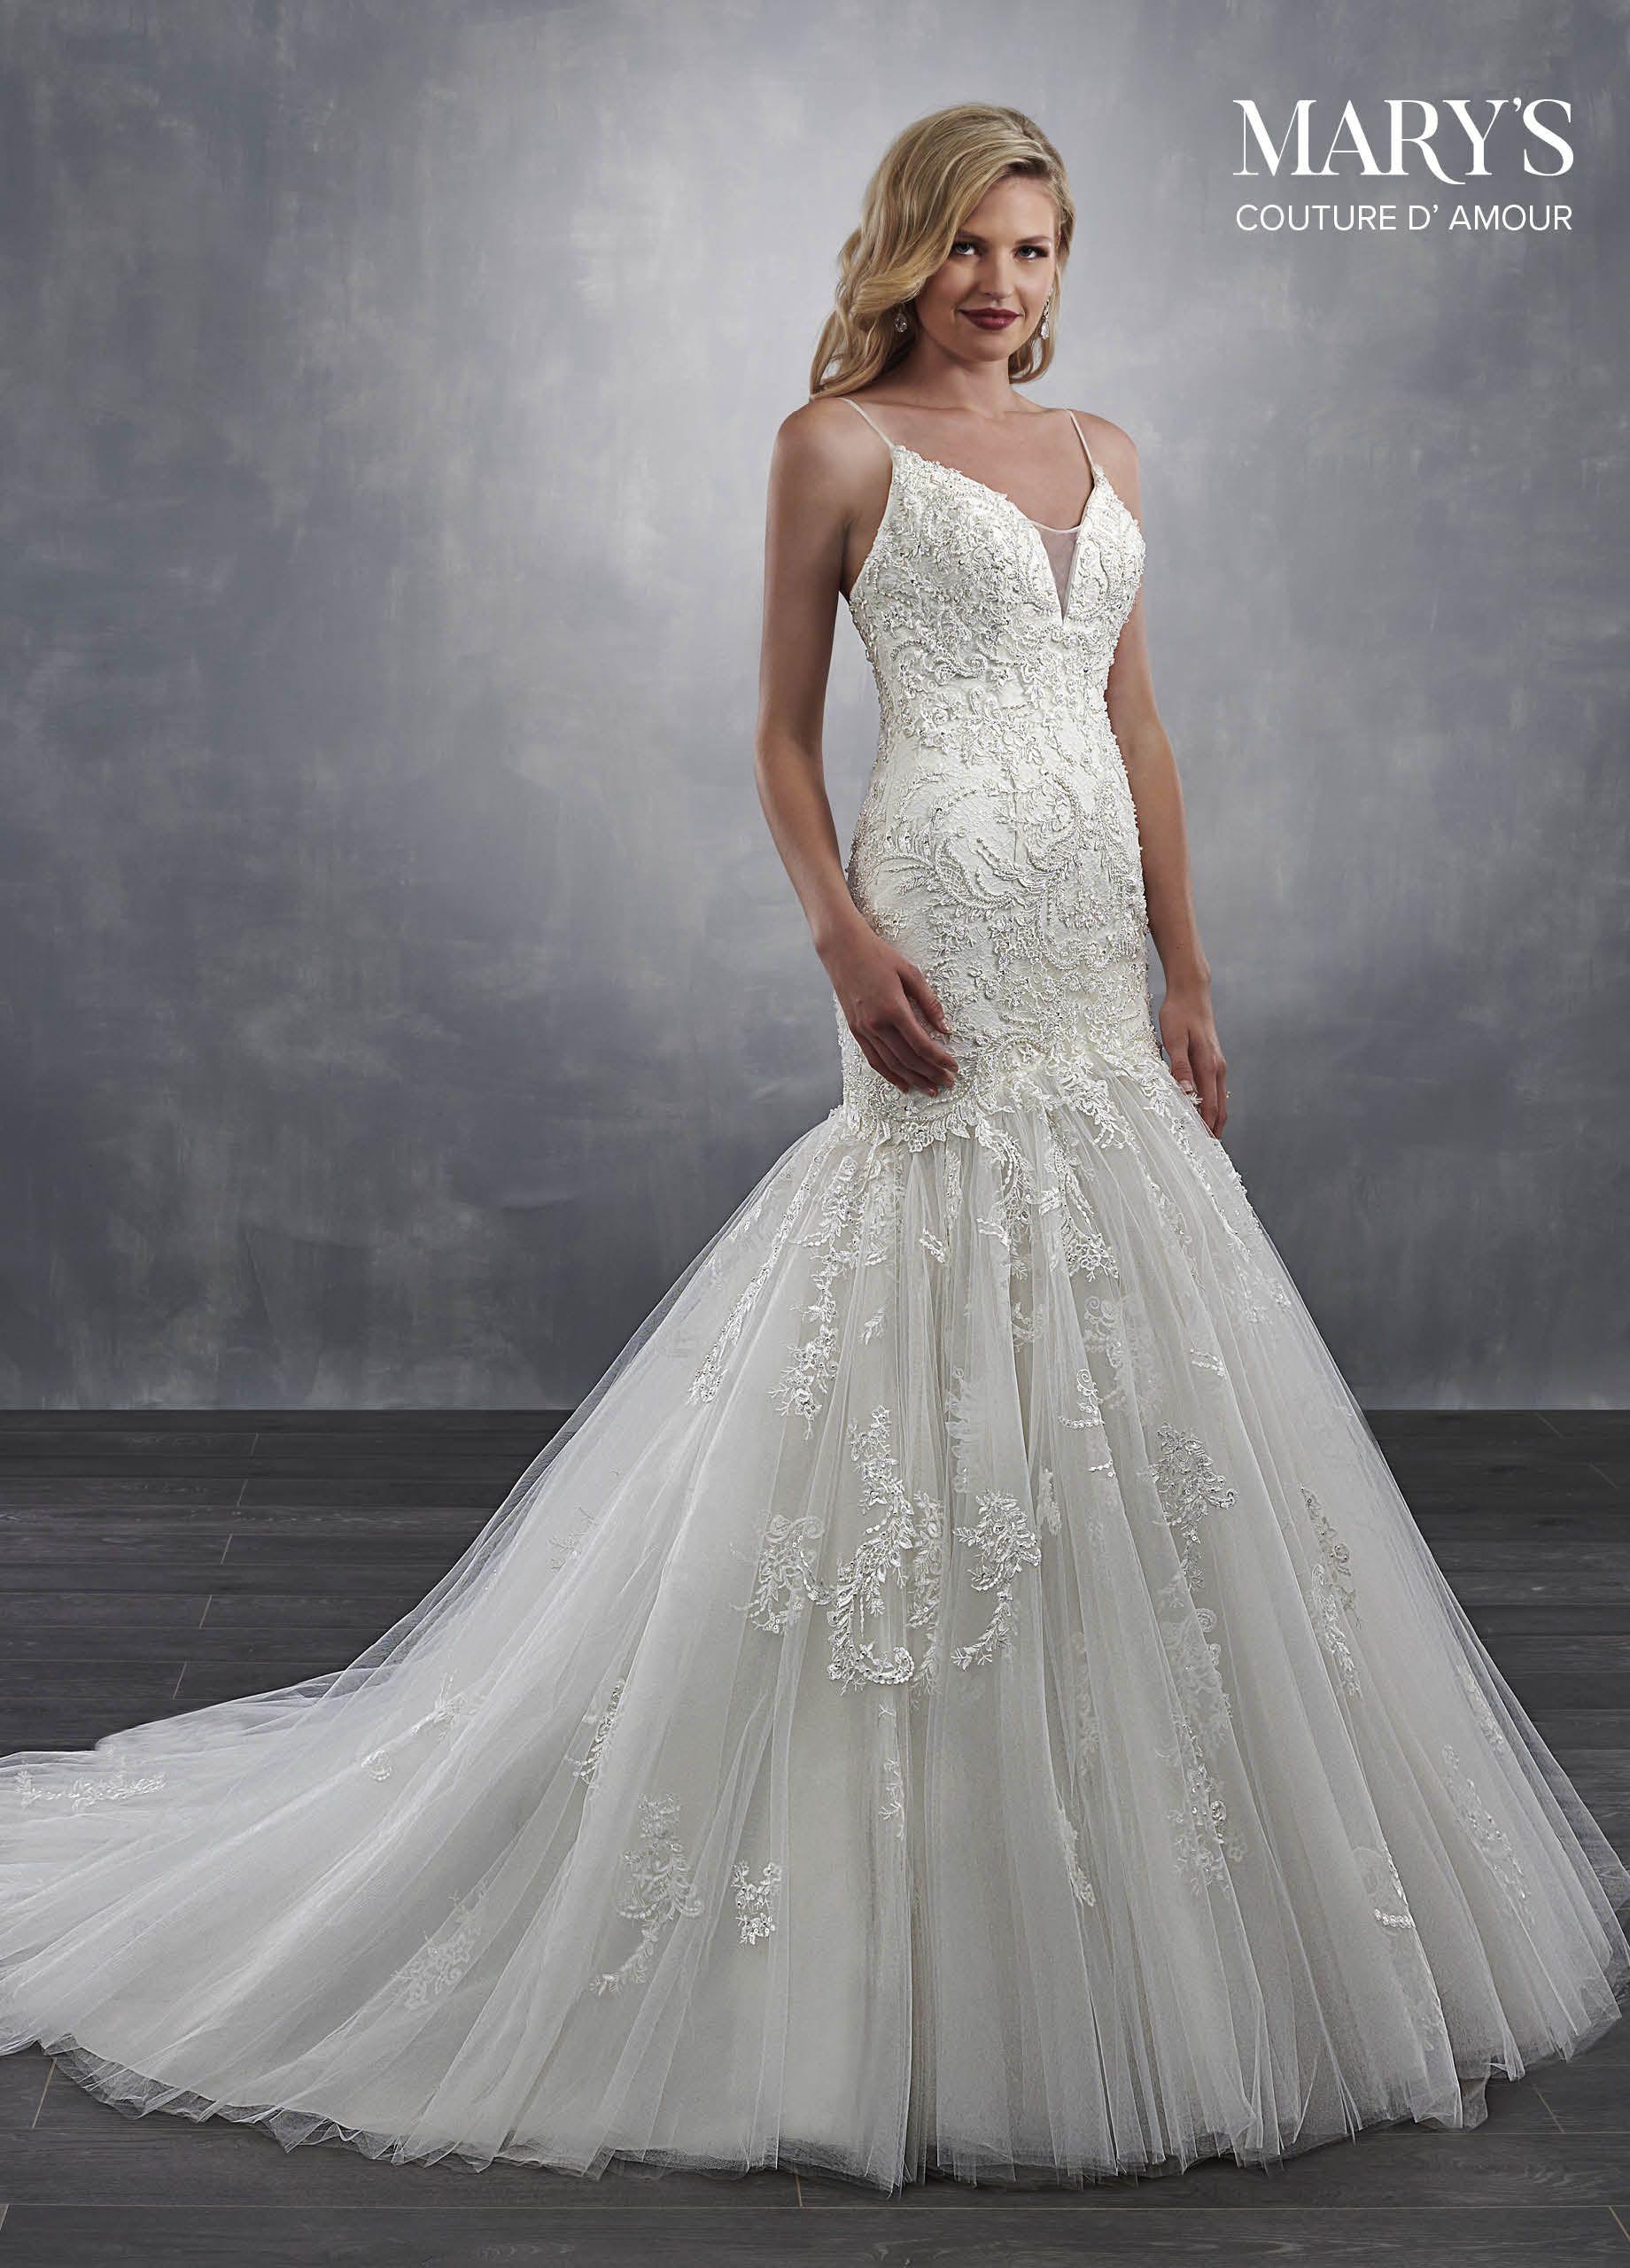 Mb4054 Wedding Dresses Wedding Dress Couture Stunning Wedding Dresses [ 2560 x 1840 Pixel ]